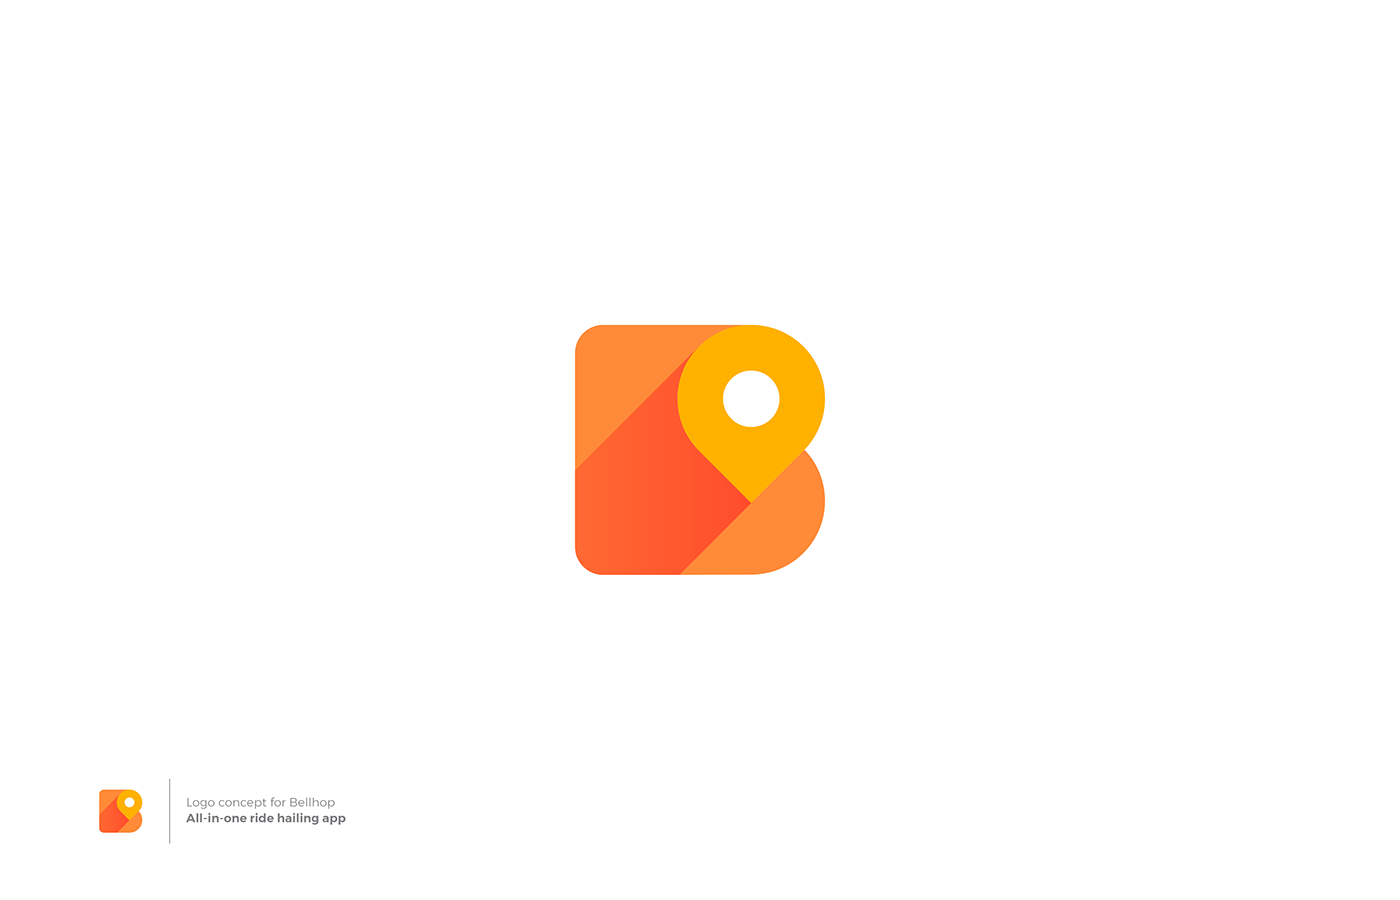 logo logos icon mark branding brand music play cryptocurrency identity design logotype stationery modern minimalist icons pin smile smile pin video editing finance app application